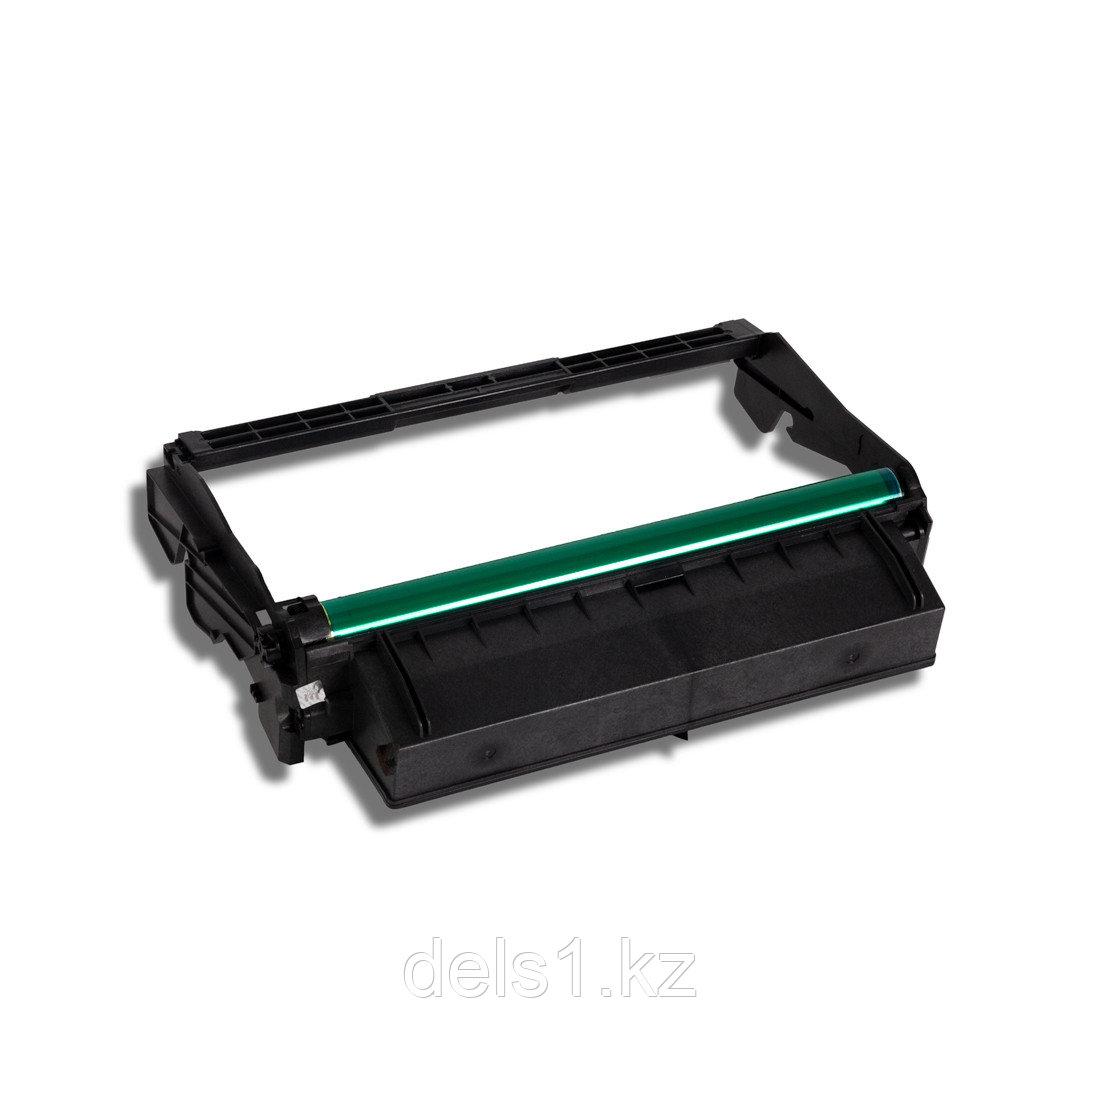 Принт-картридж, Europrint, EPC-101R00555 (WC3335/3345), Для принтеров Xerox Phaser 3330, WorkCentre 3335/3345,